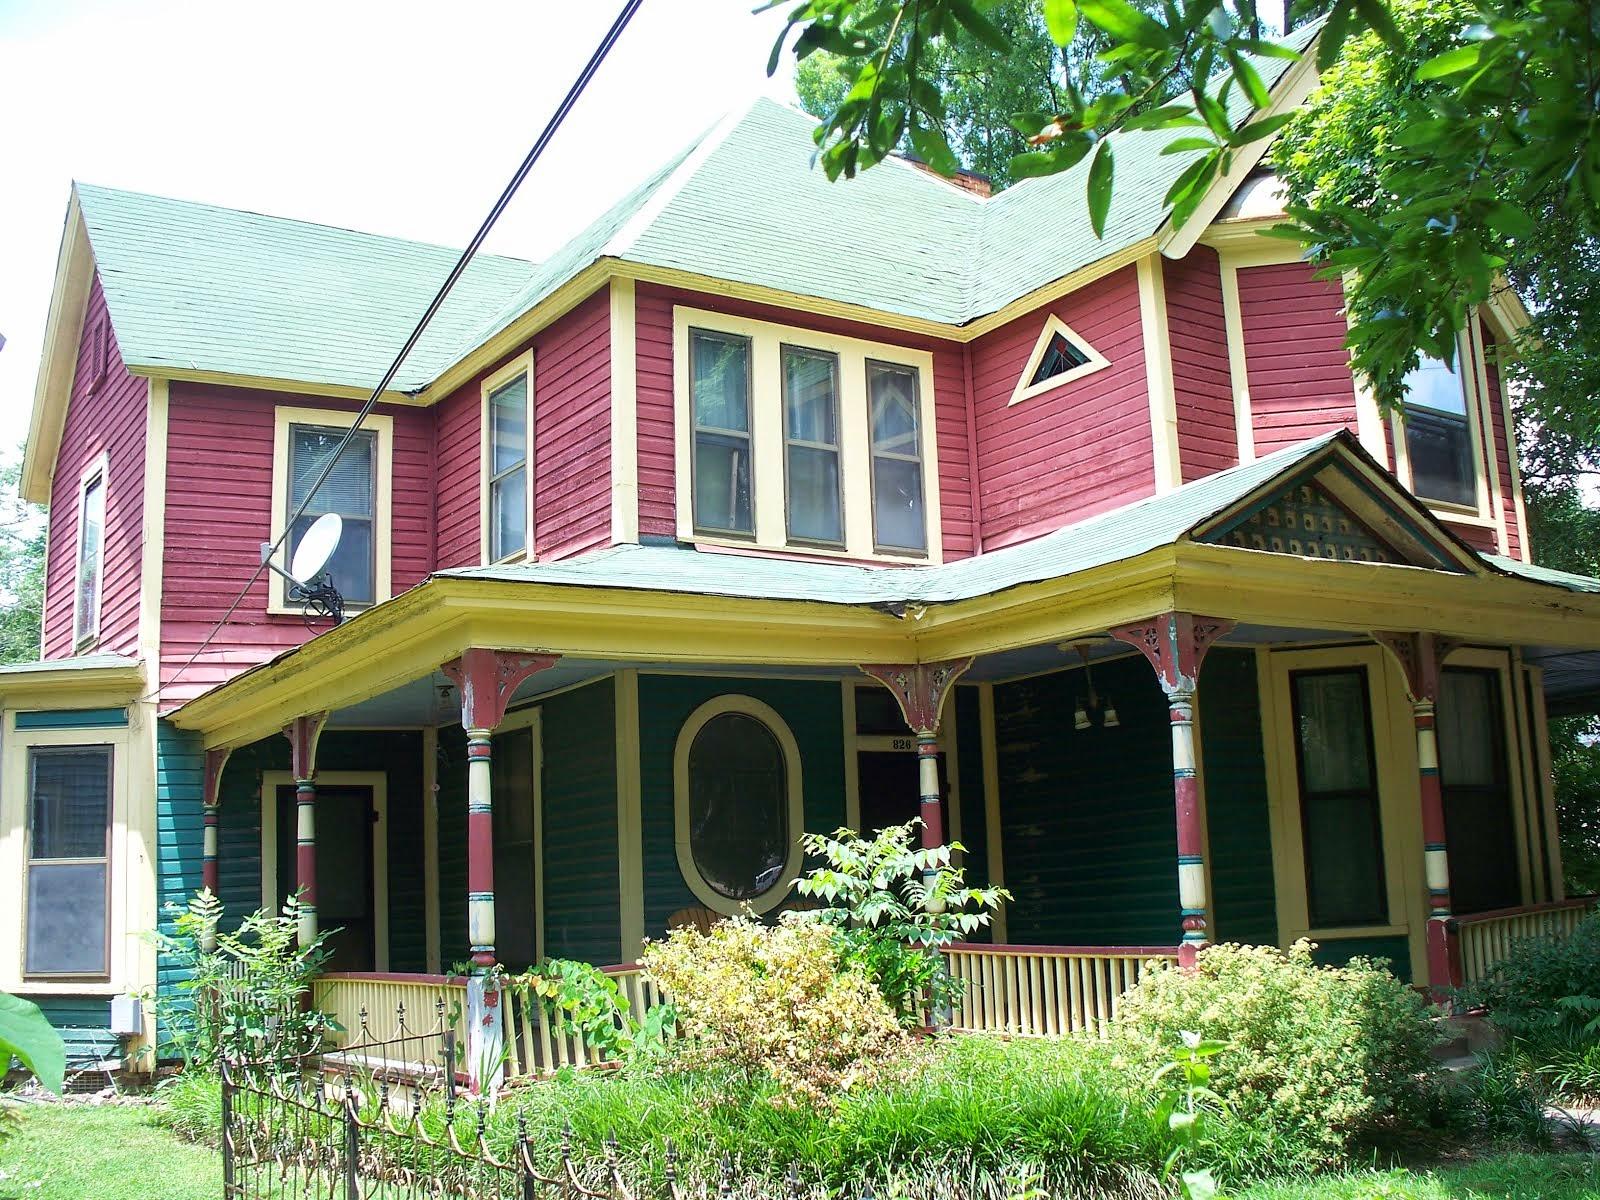 826 N Main Street, Salisbury NC ~ Circa 1900 ~ $65,000